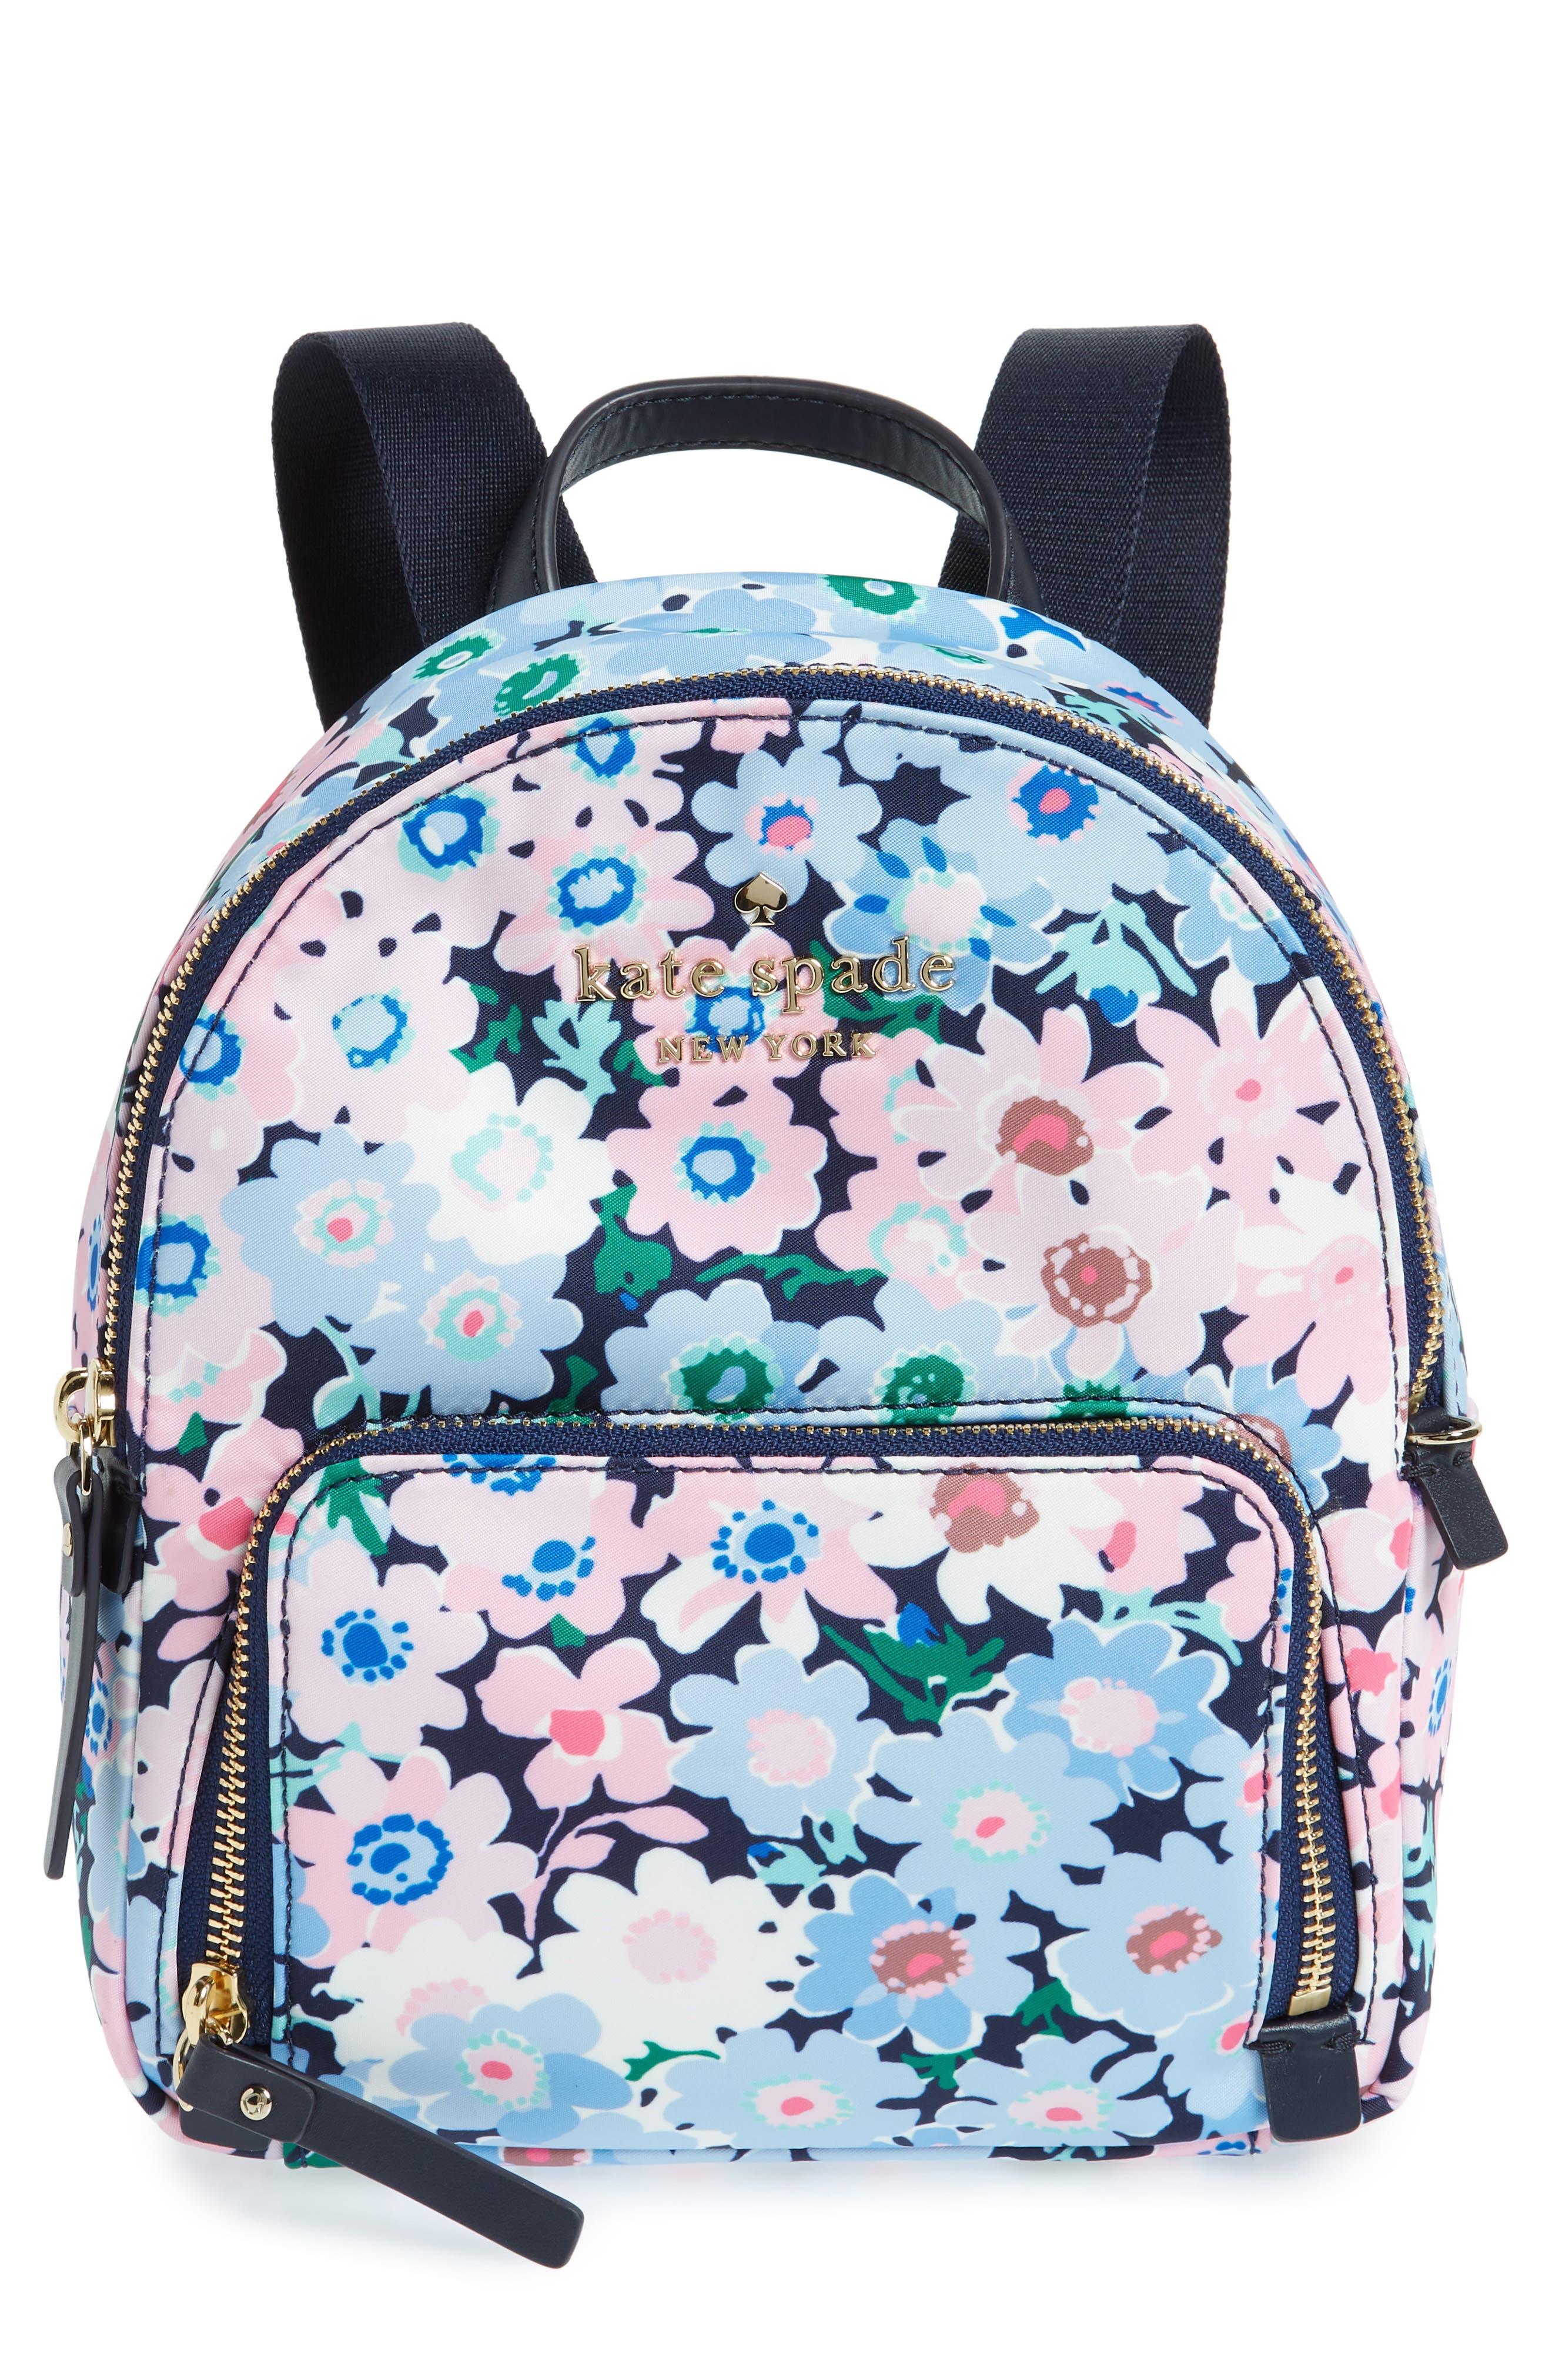 watson lane - daisy garden small hartley backpack,                         Main,                         color, Blue Multi